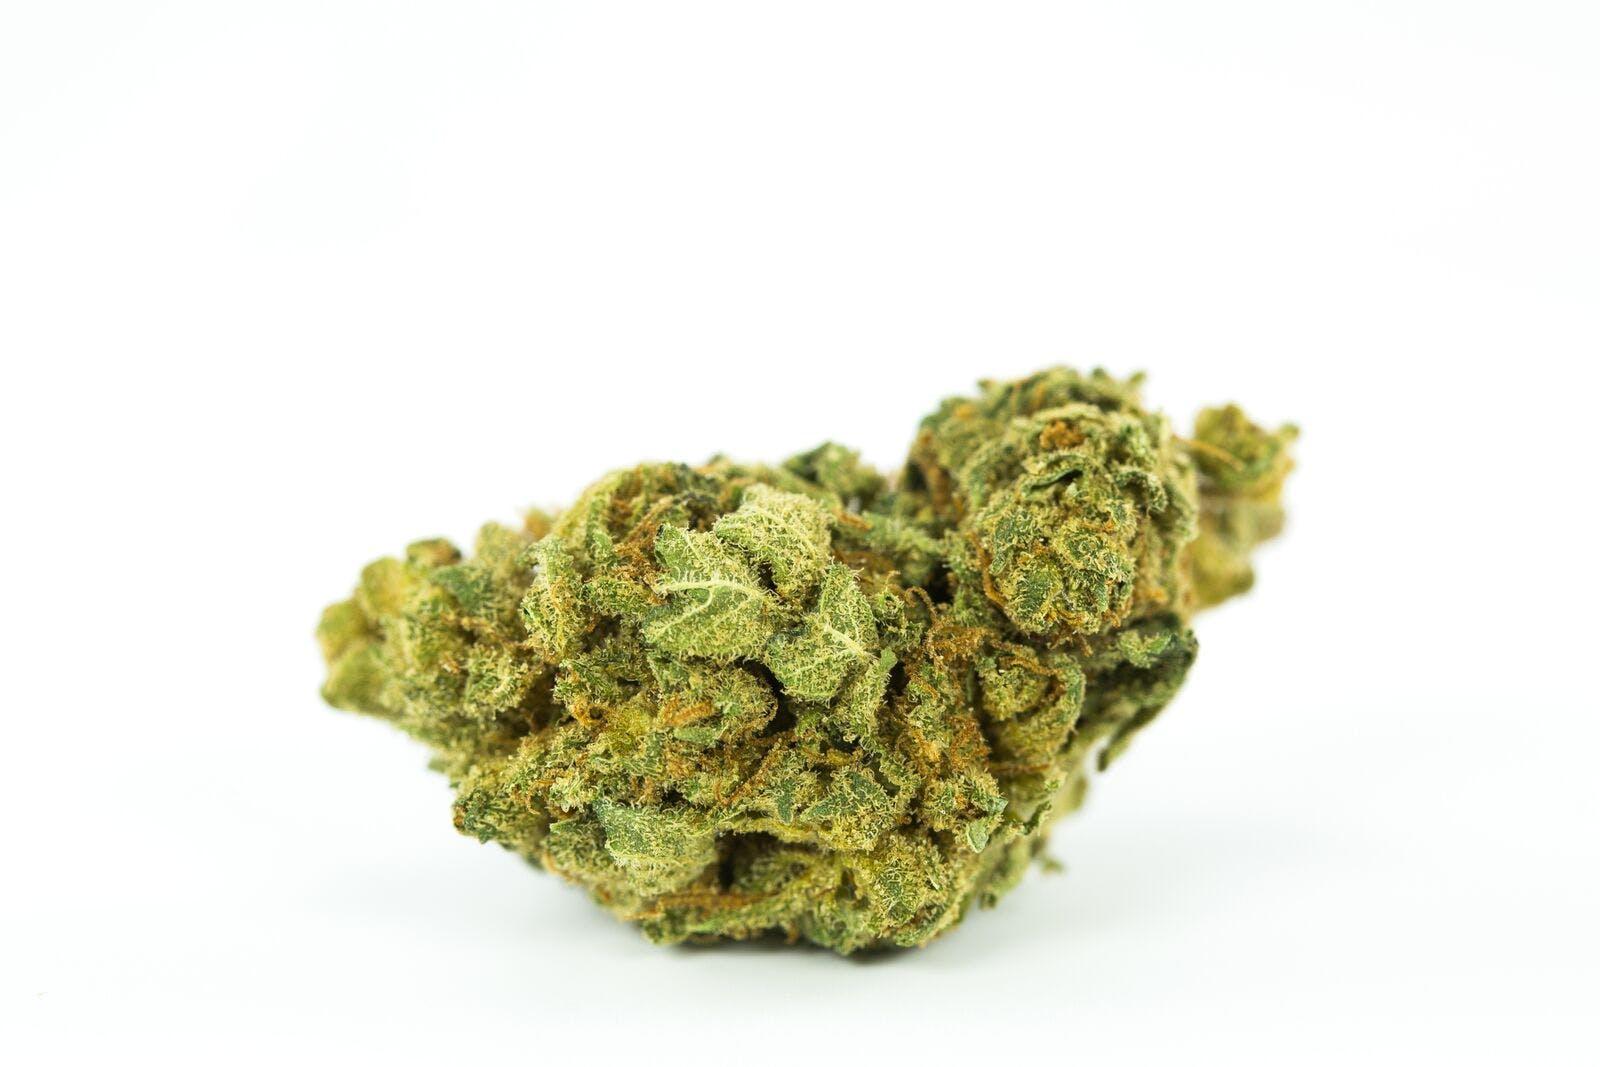 Cannalope Kush Marijuana Strain Caribbean Nations Are Seriously Thinking About Cannabis Decriminalization